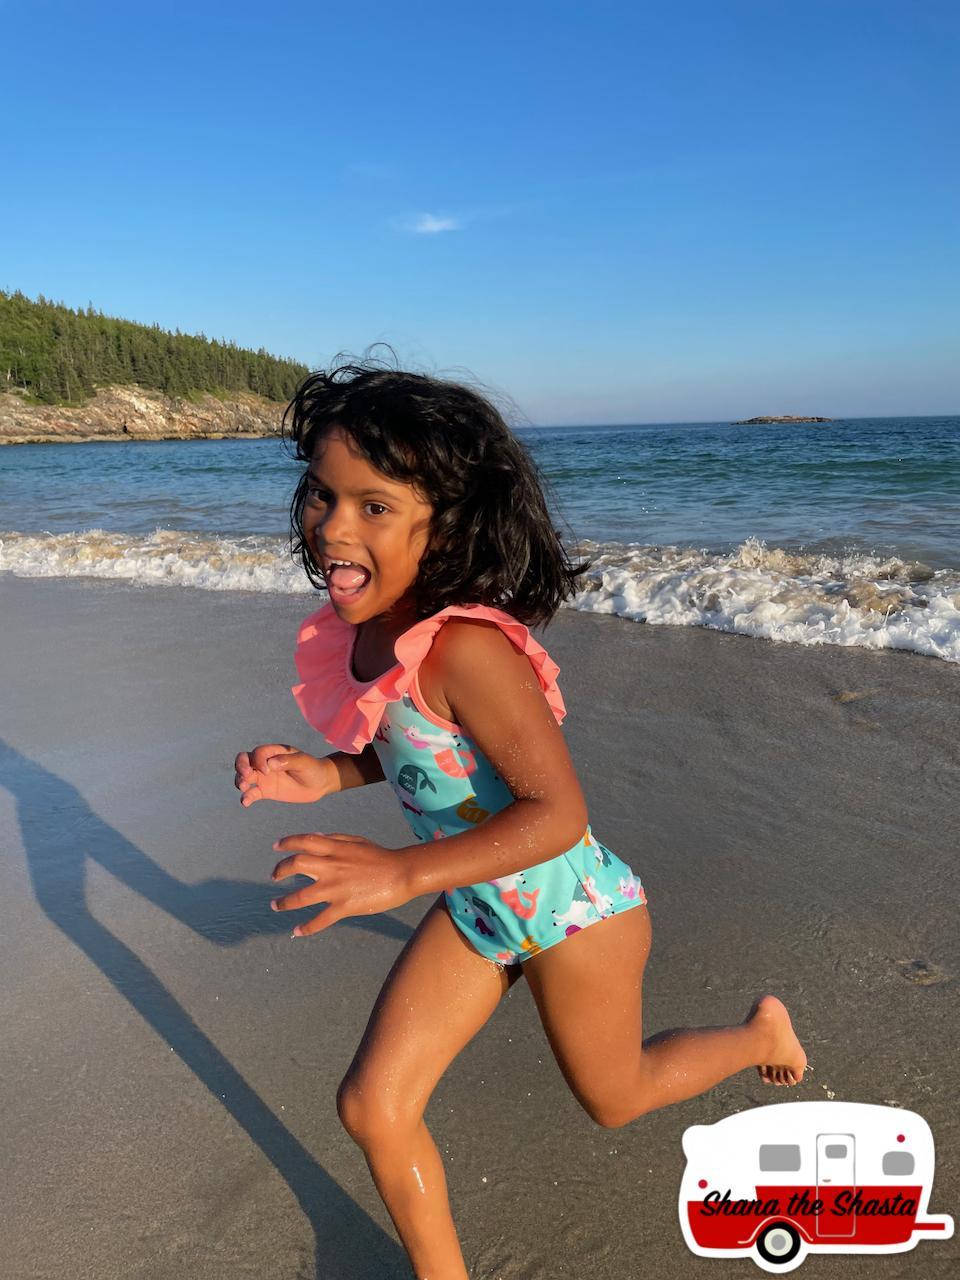 Happy-Girl-at-Sand-Beach-in-Acadia